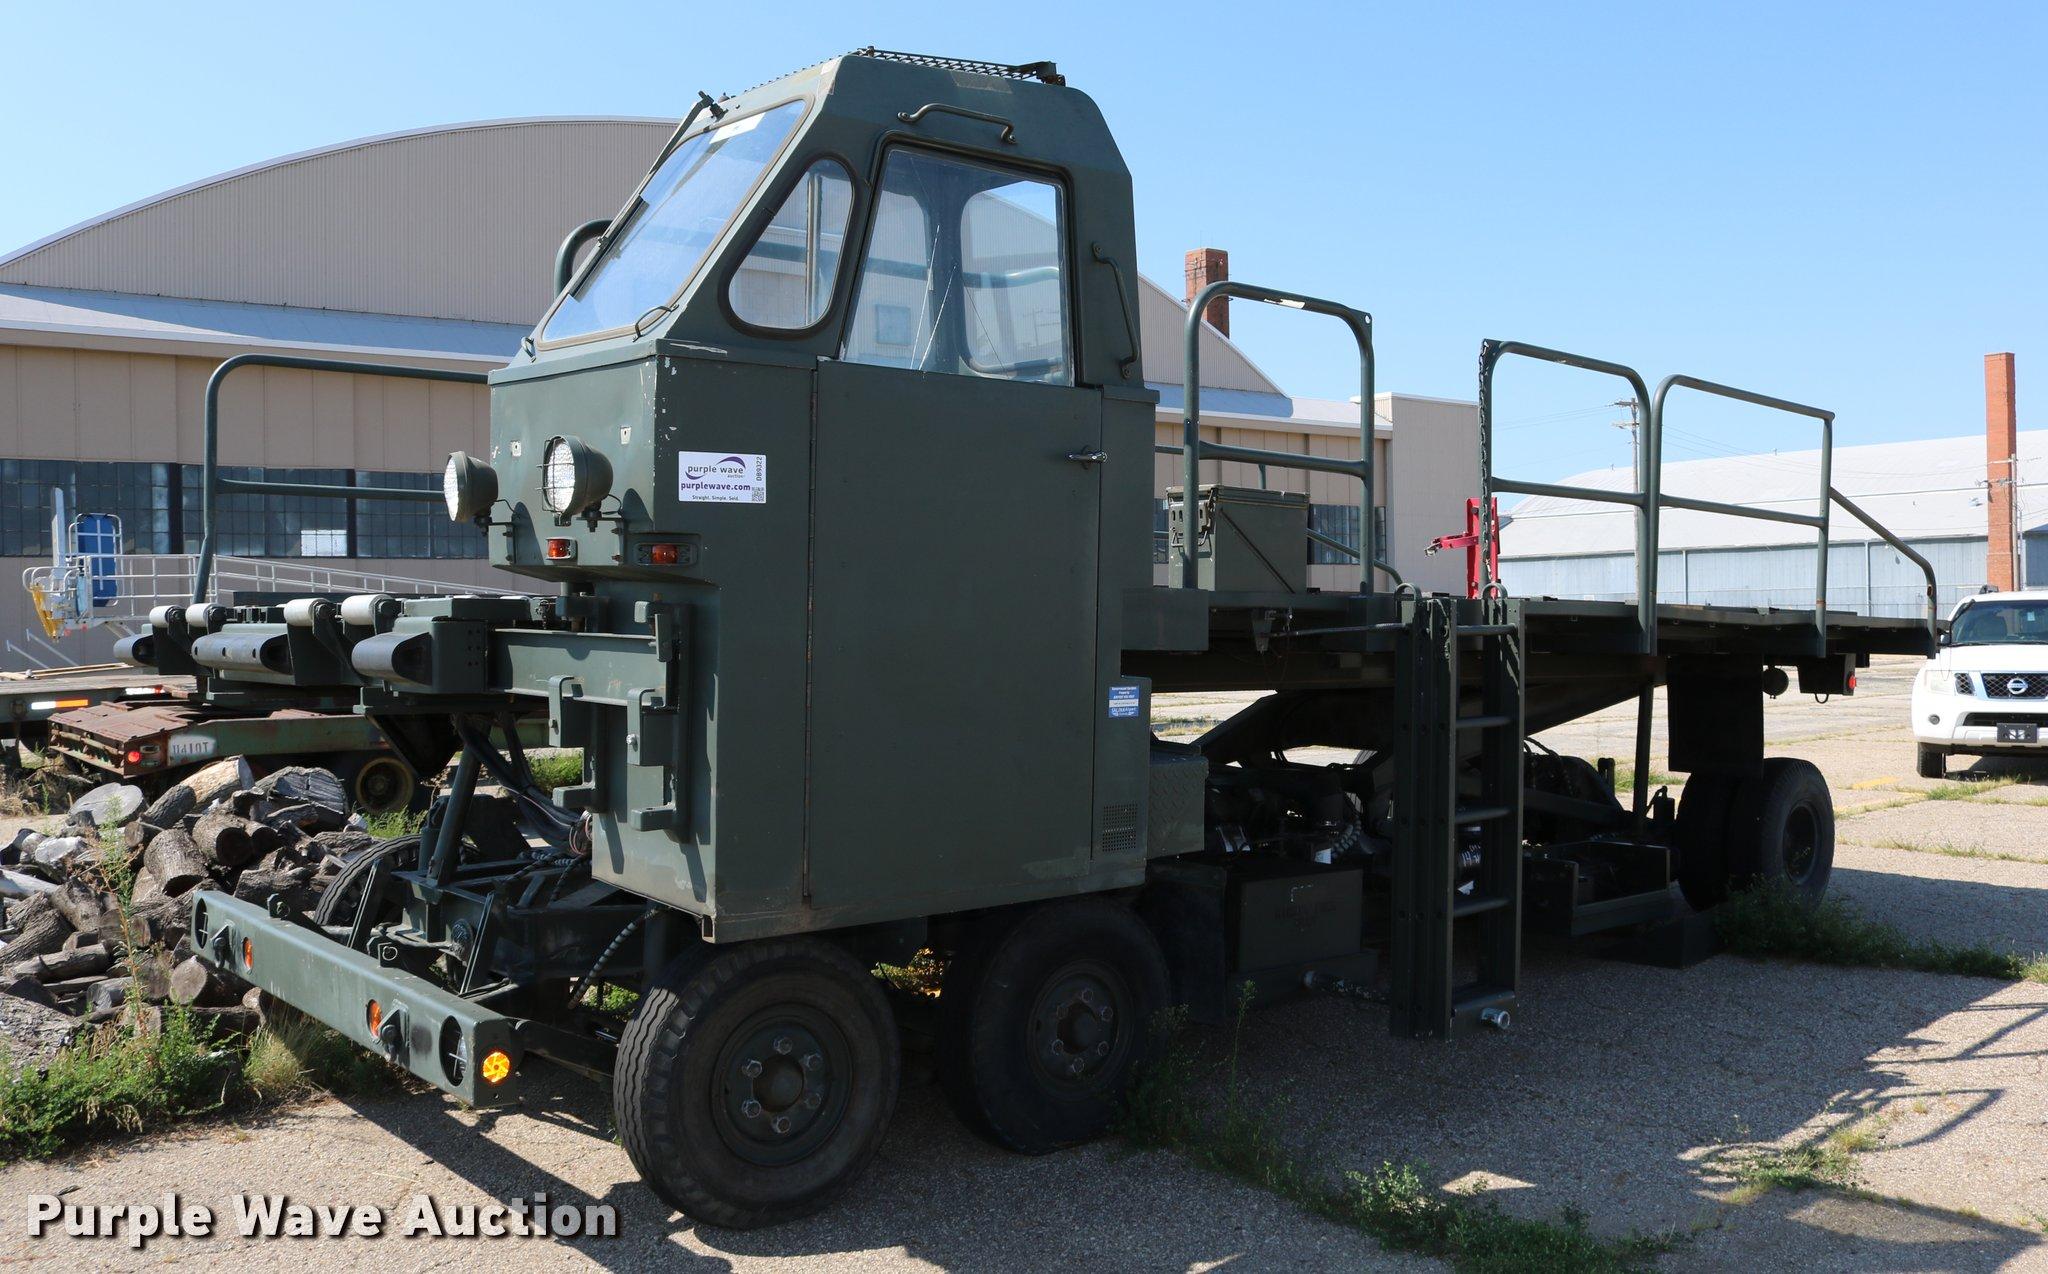 Emerson Military K aircraft cargo loader | Item DB9322 | SOL